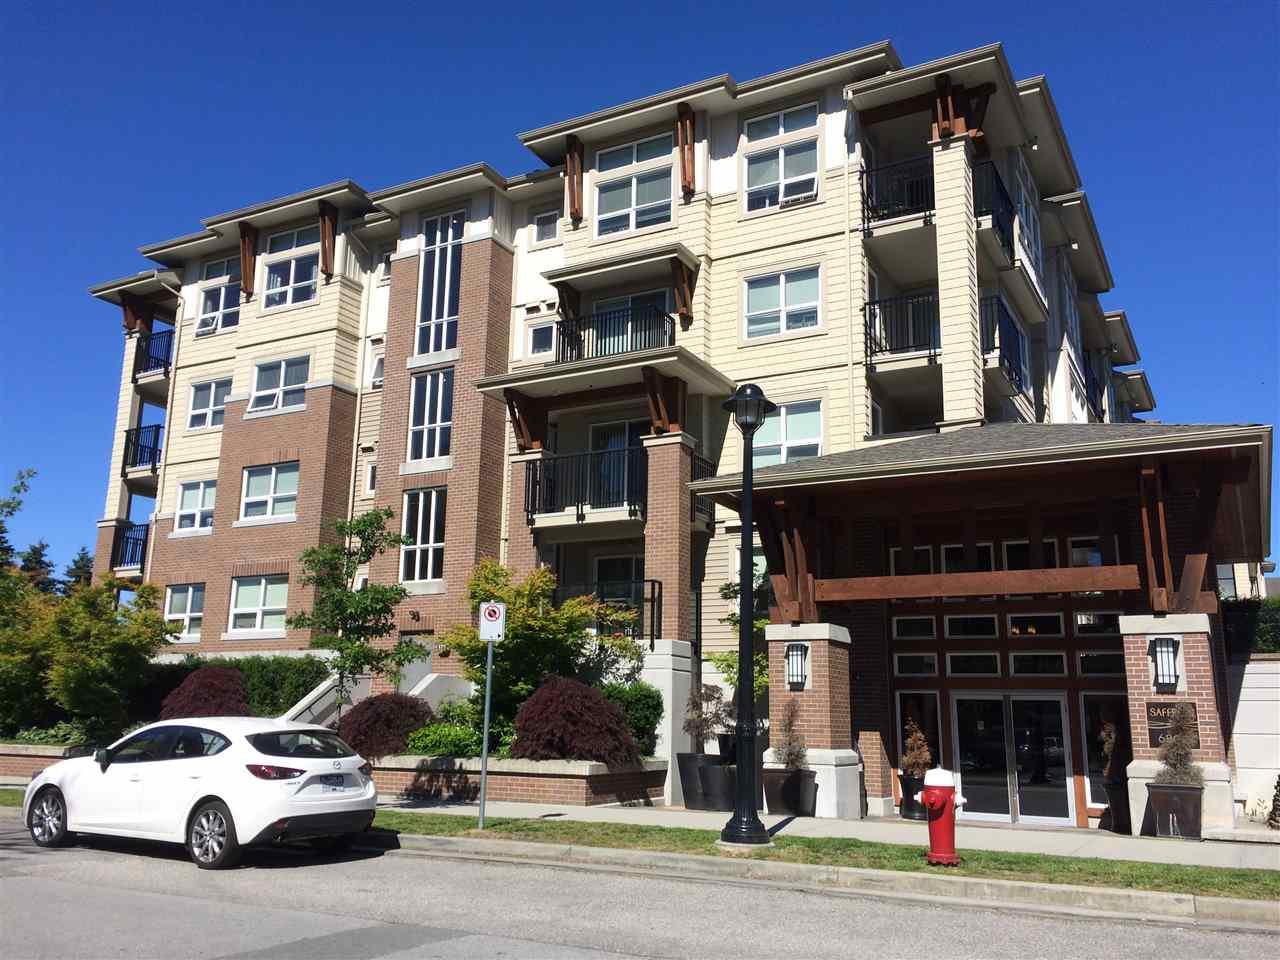 Condo Apartment at 108 6800 ECKERSLEY ROAD, Unit 108, Richmond, British Columbia. Image 1